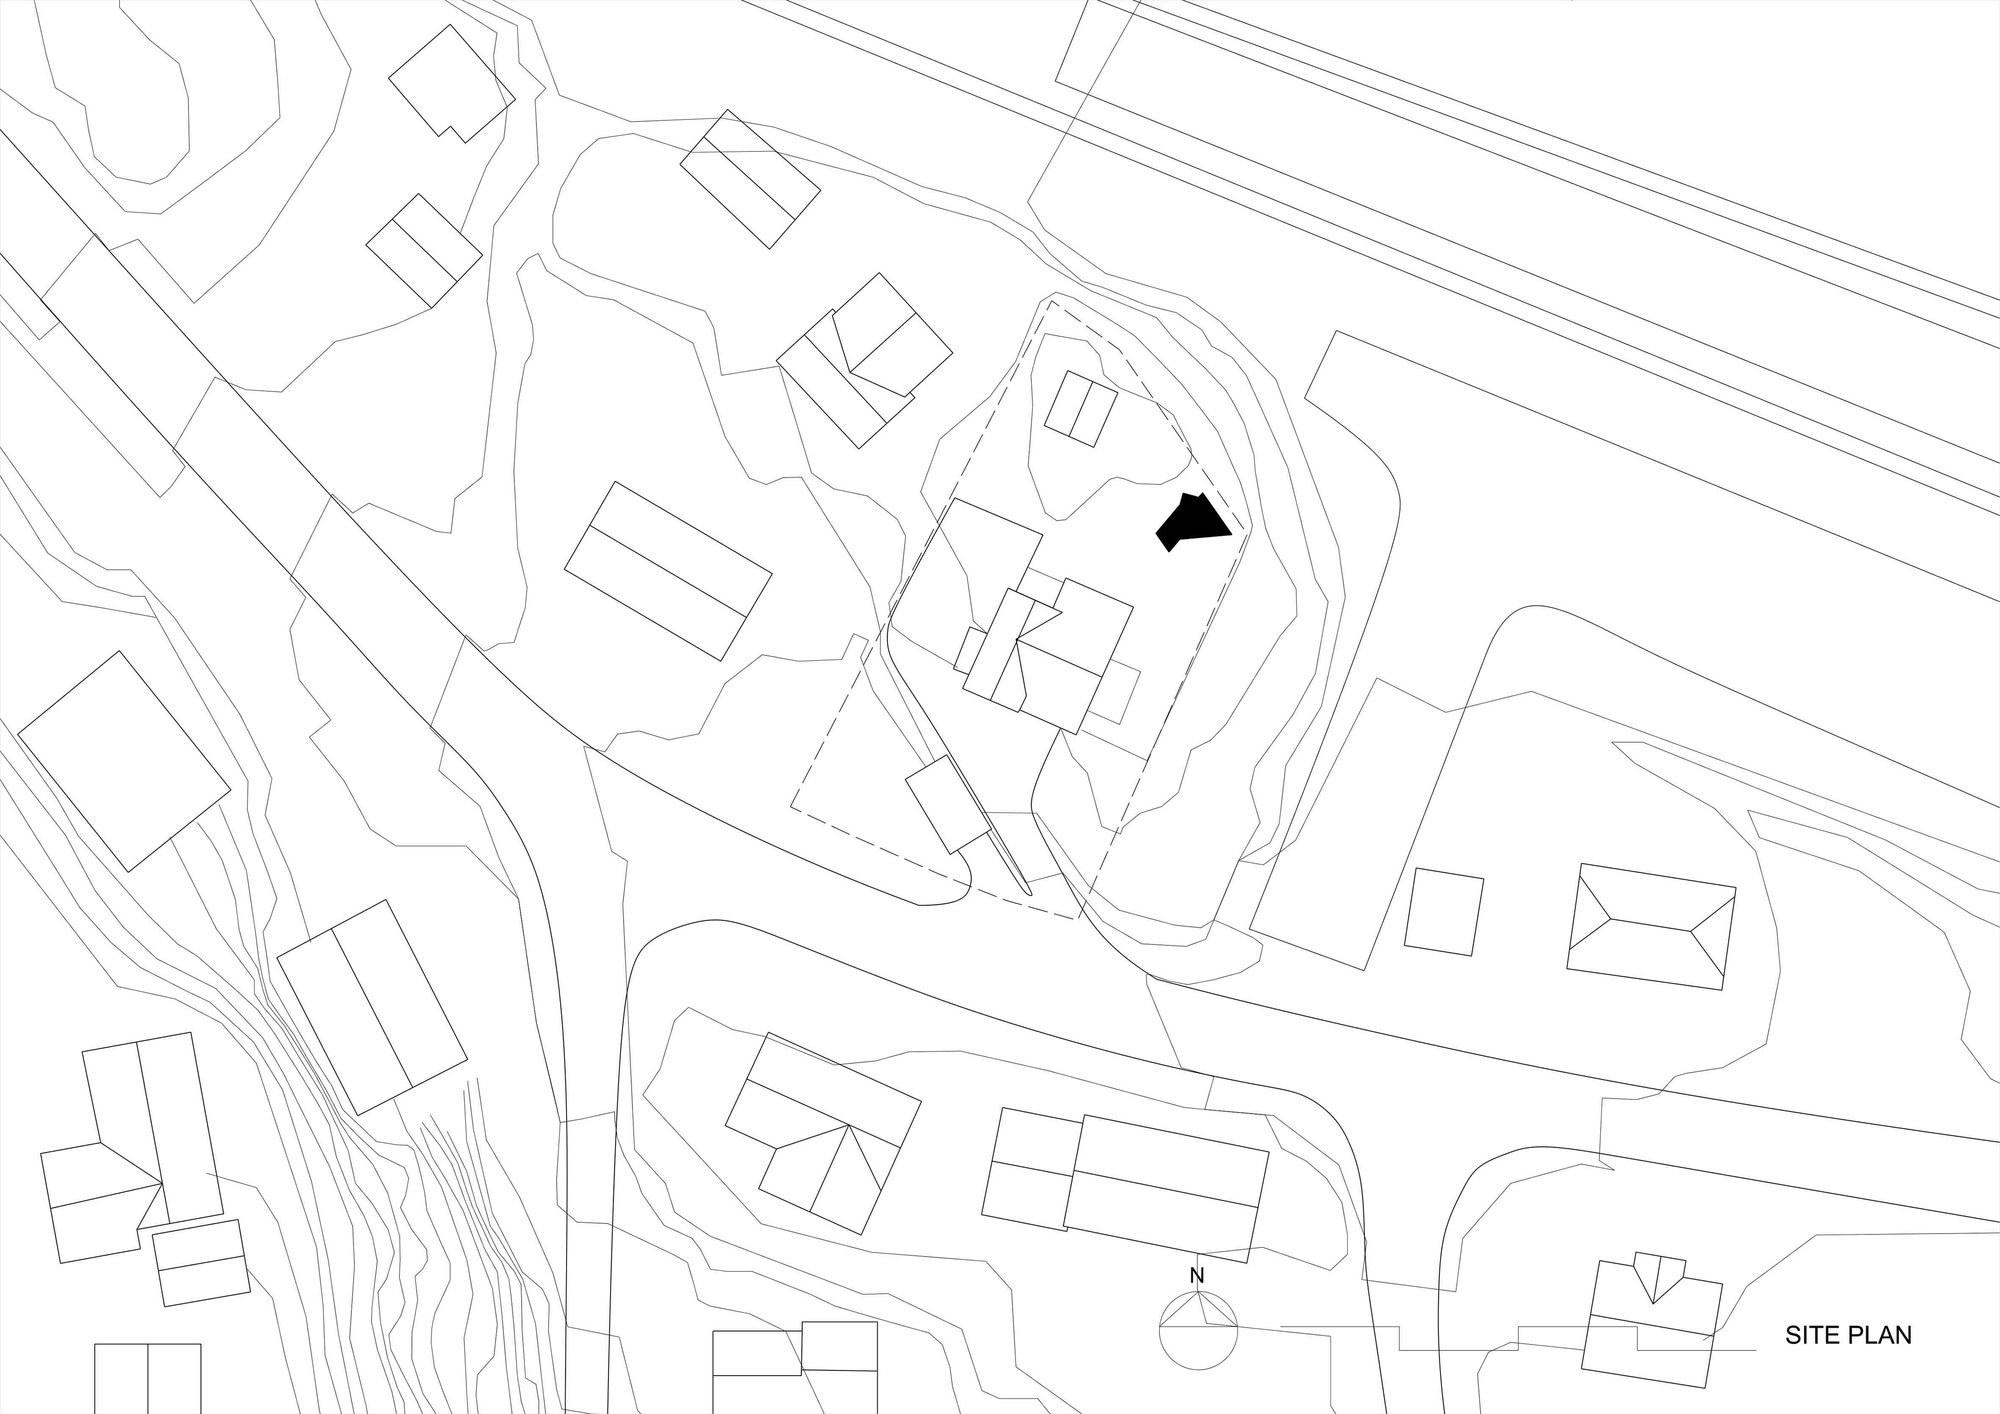 Writers' Cottage by Jarmund/Vigsnæs Architects